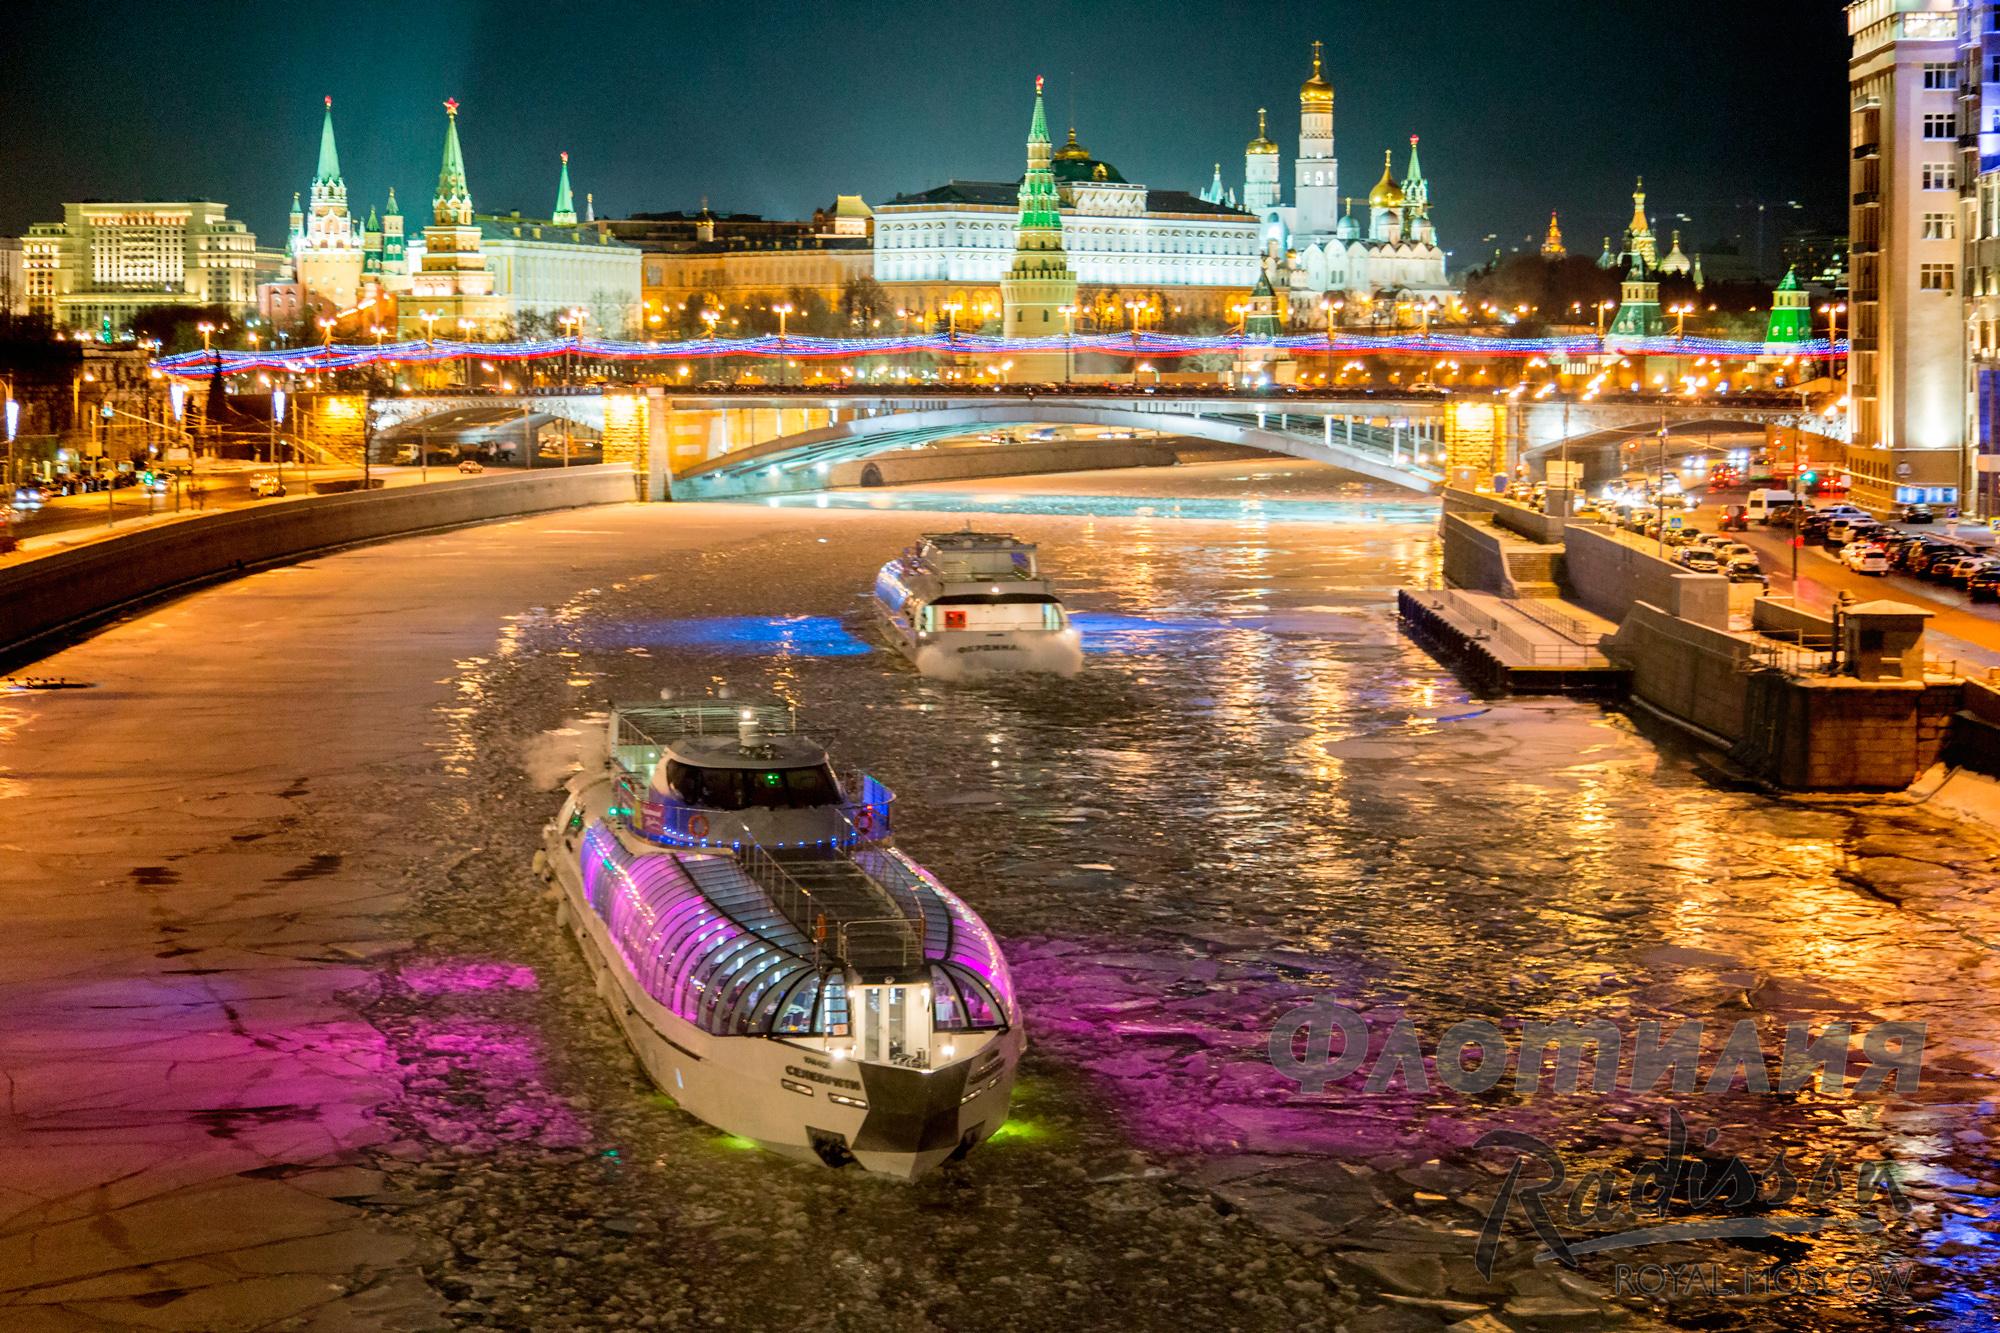 On Board the Moscow Cruises: An Interview with Olga Tkacheva, Flotilla Radisson Royal